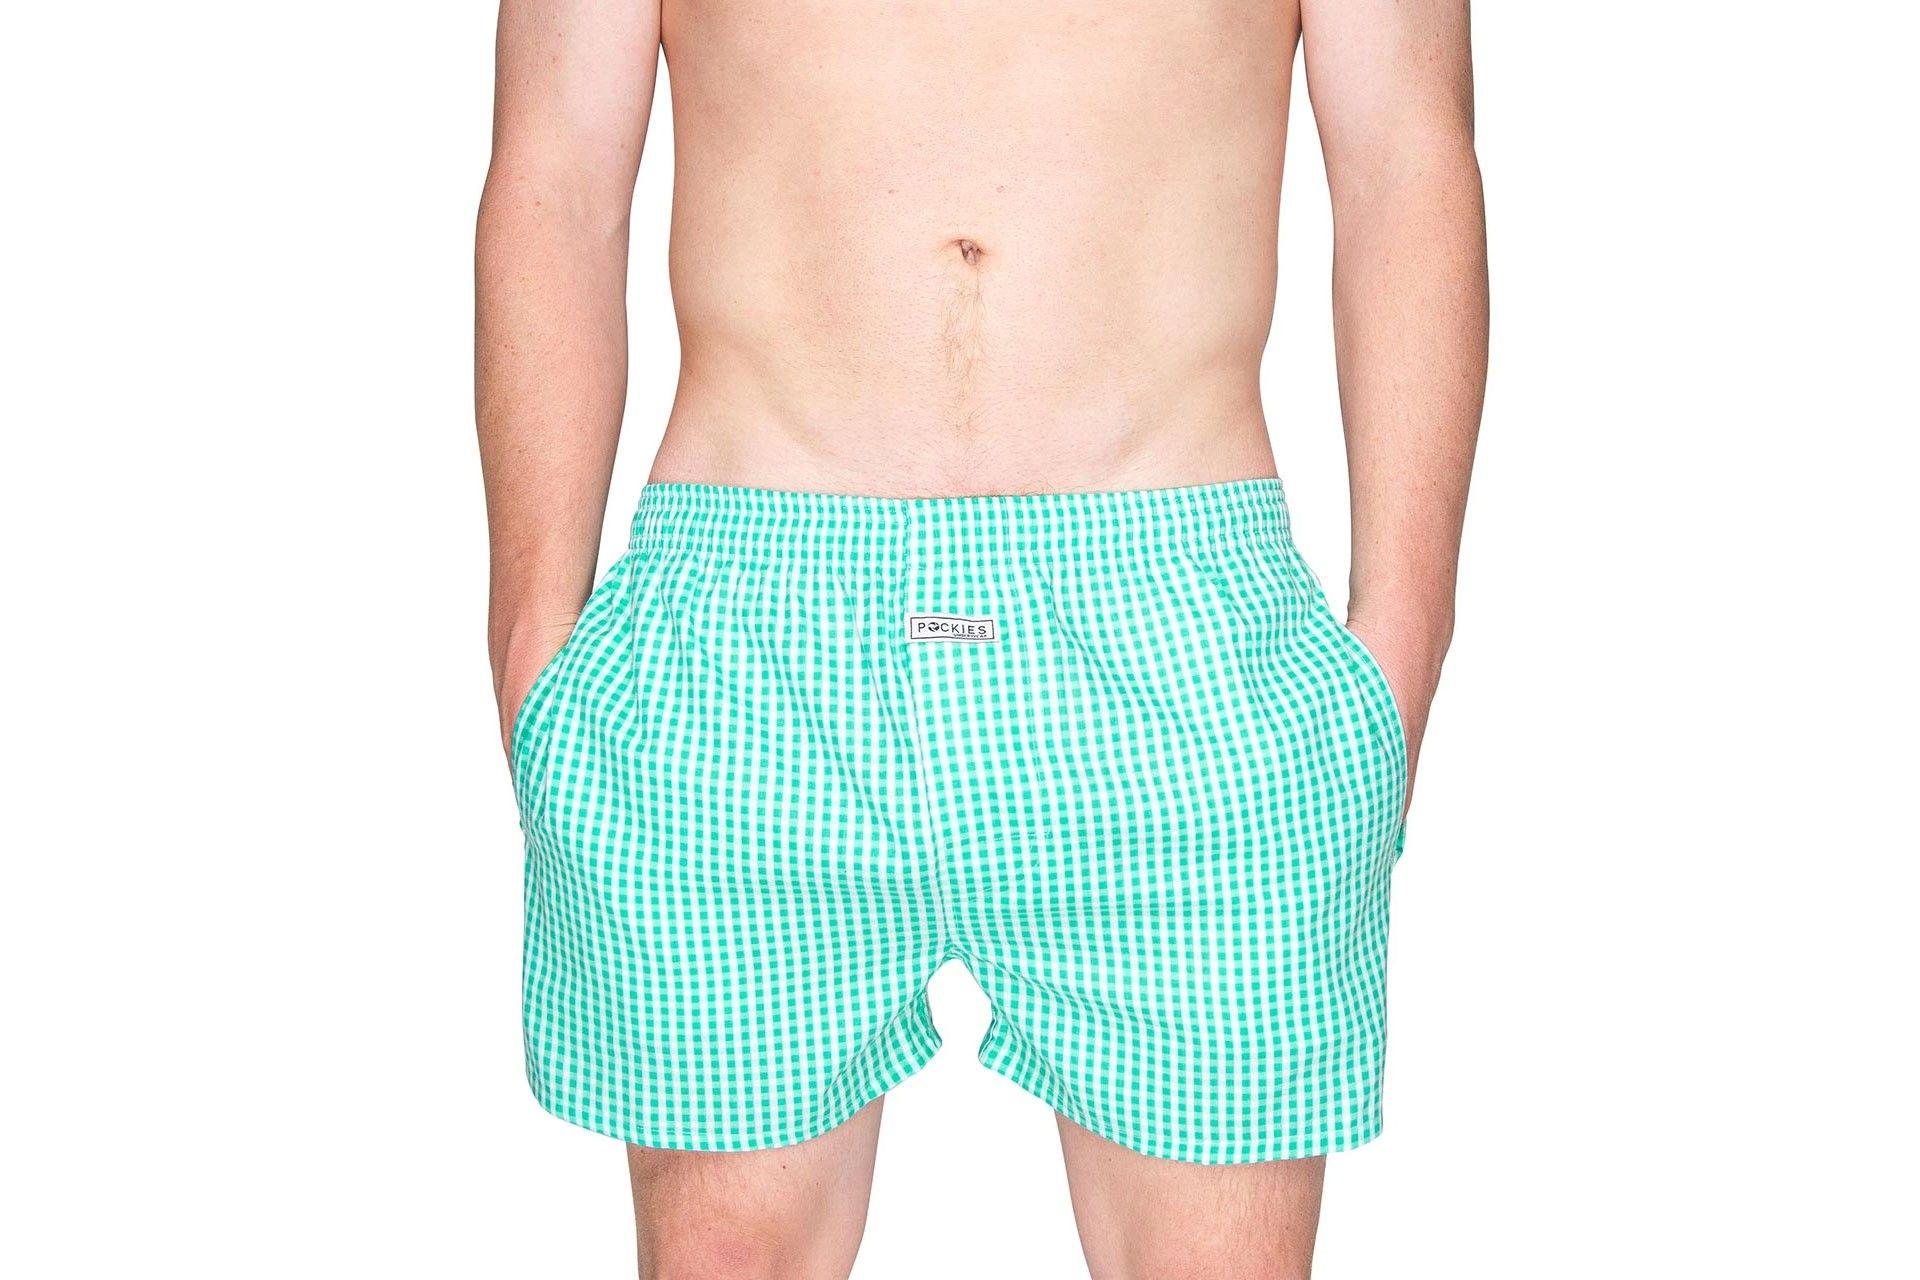 Afbeelding van Pockies Boxershort Squared Green - White